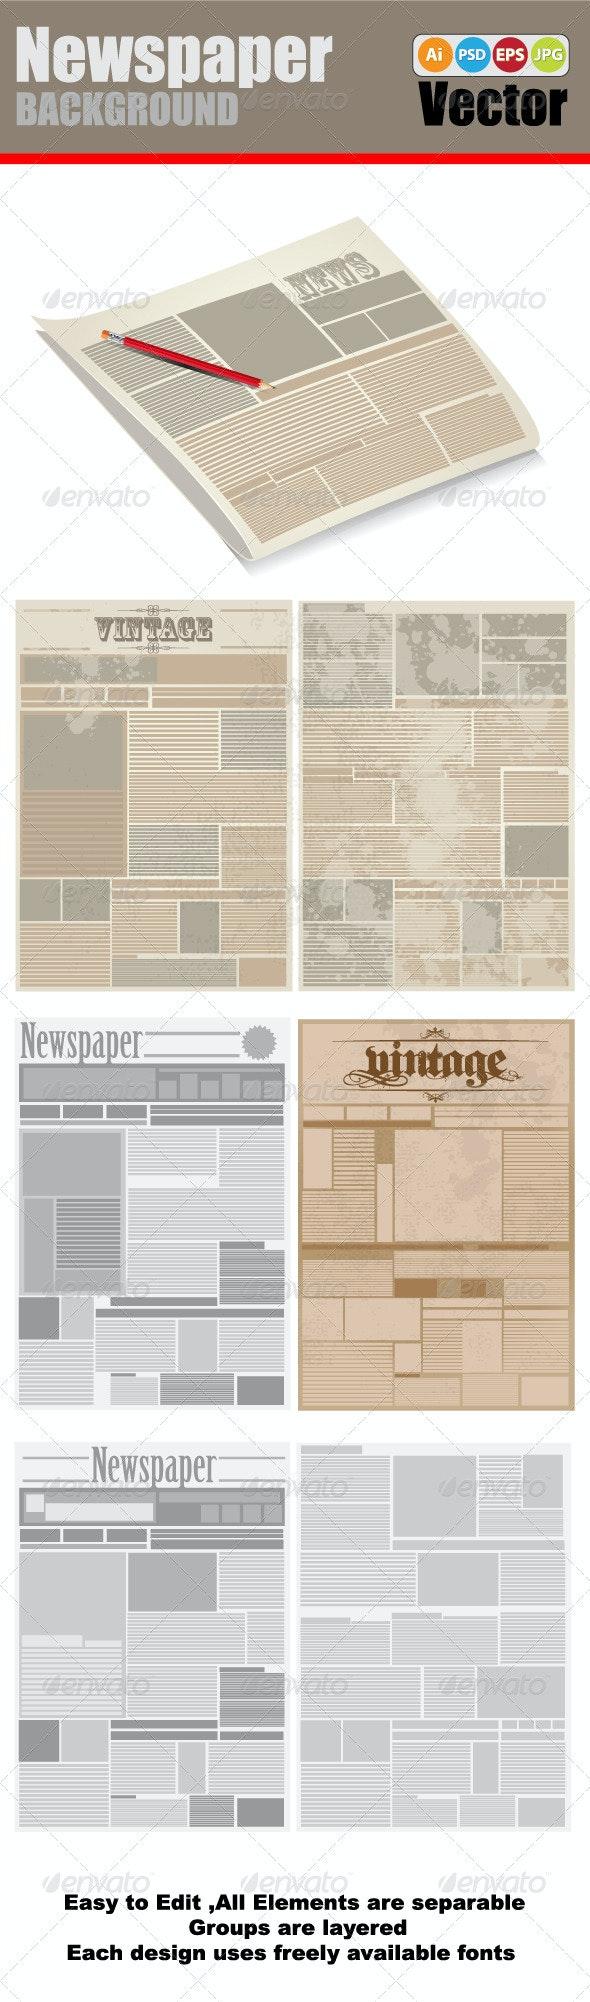 Vector Newspaper Background - Backgrounds Decorative